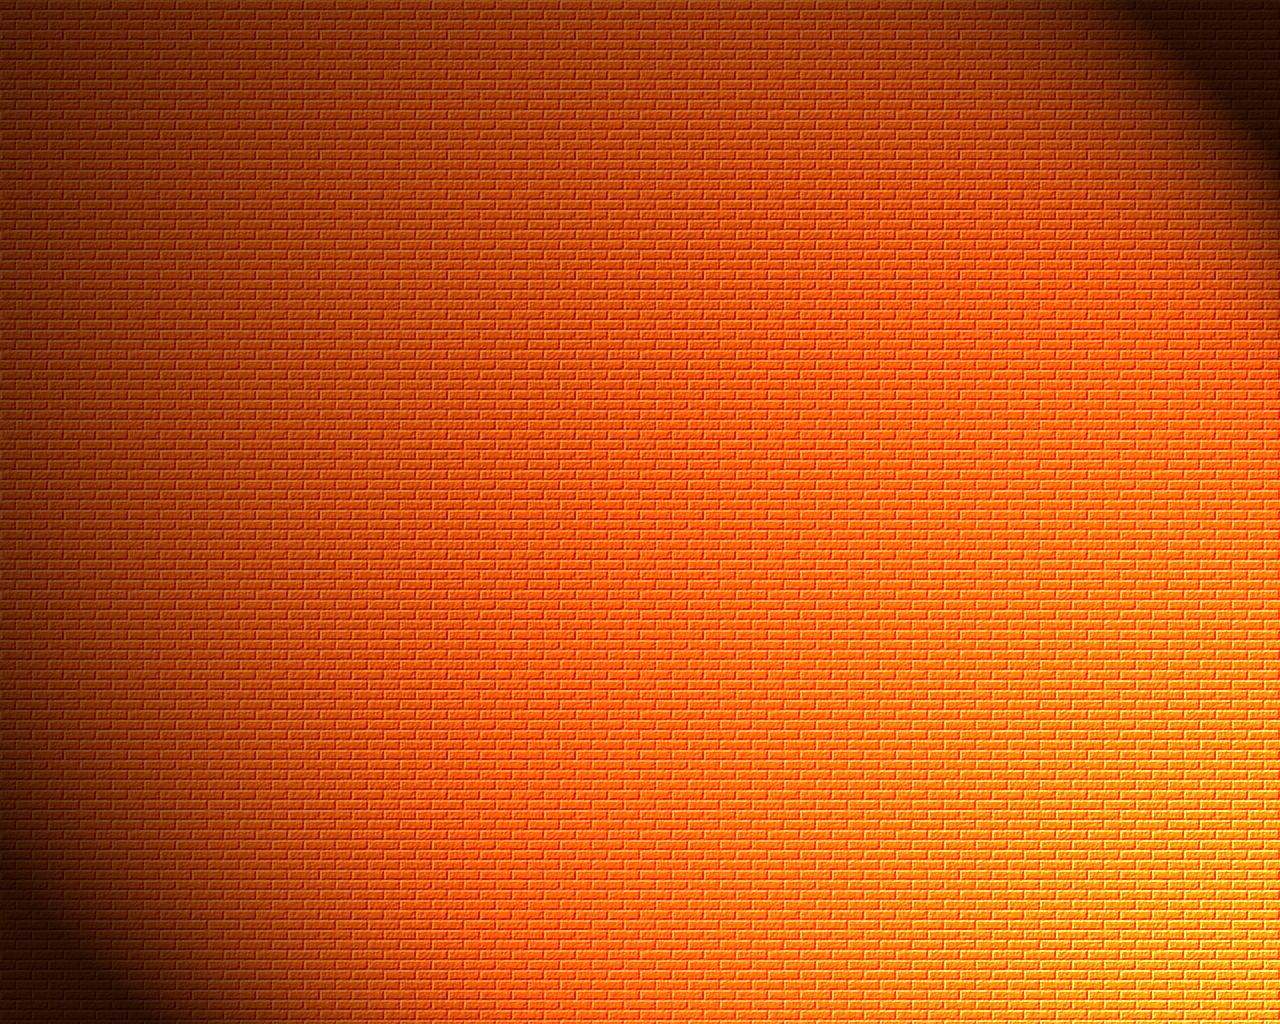 orange brick wall, texture, bricks, brick wall texture, background, download